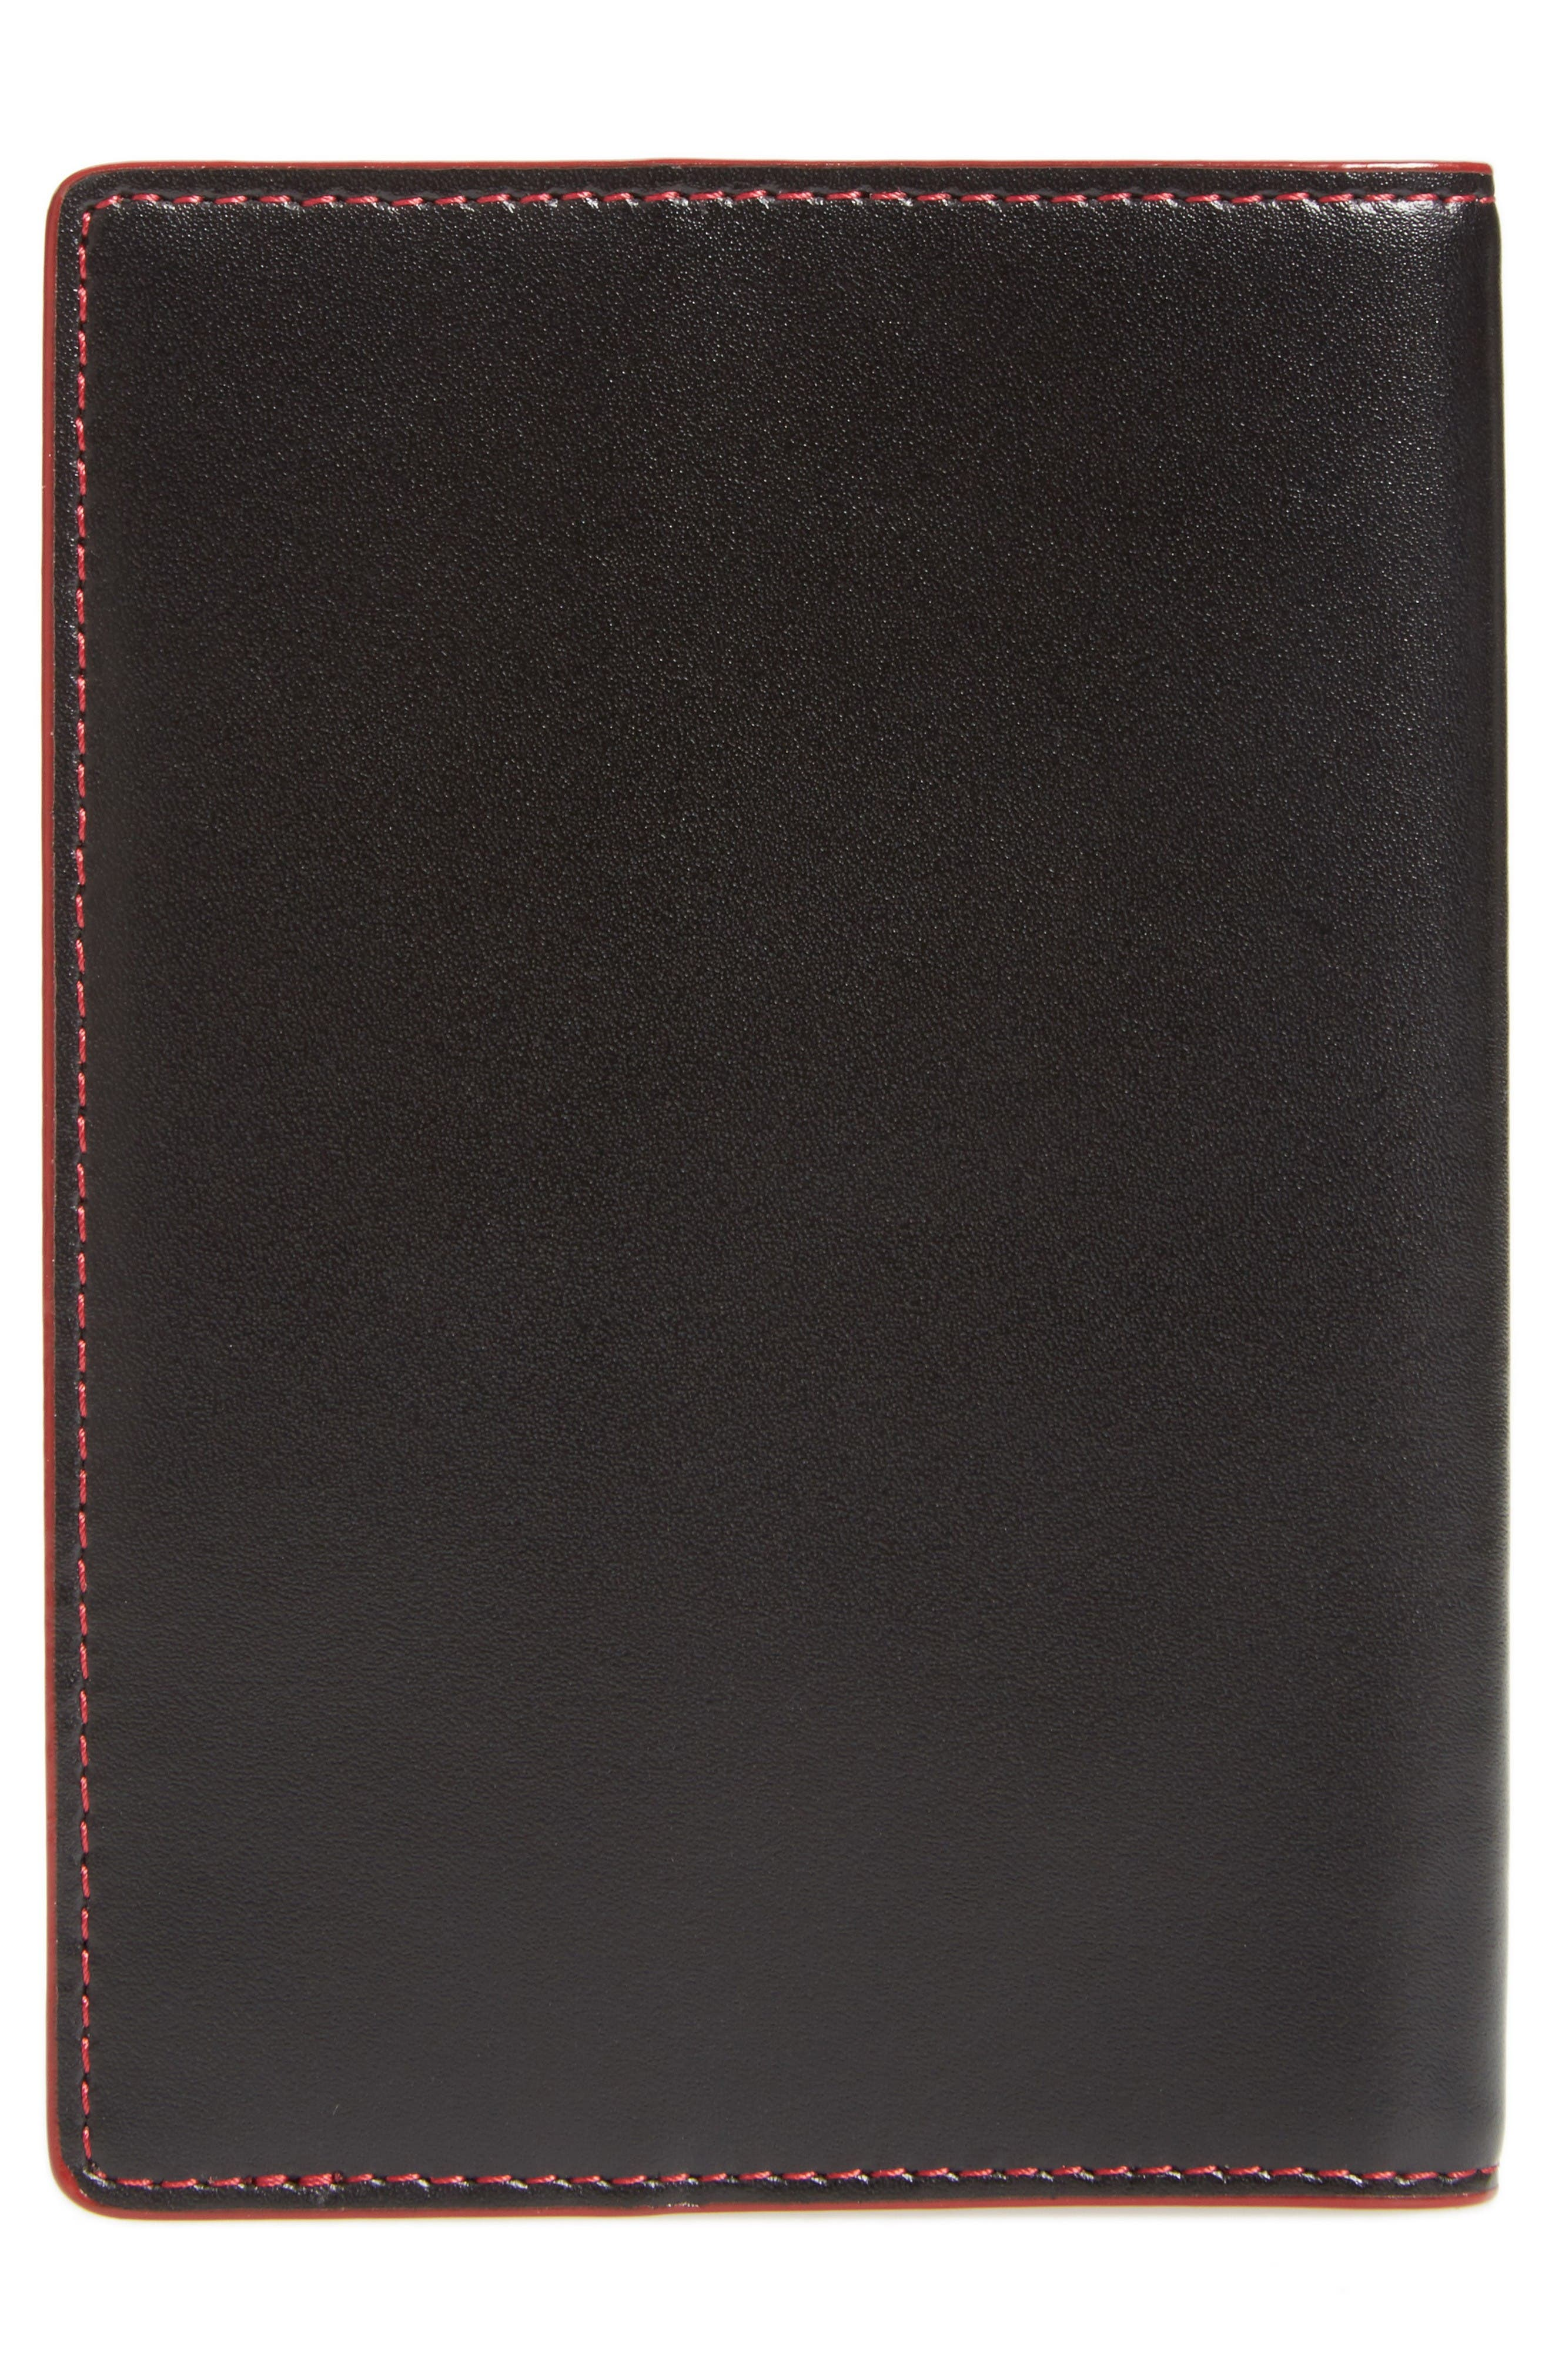 Alternate Image 3  - Lodis 'Audrey' Passport Case